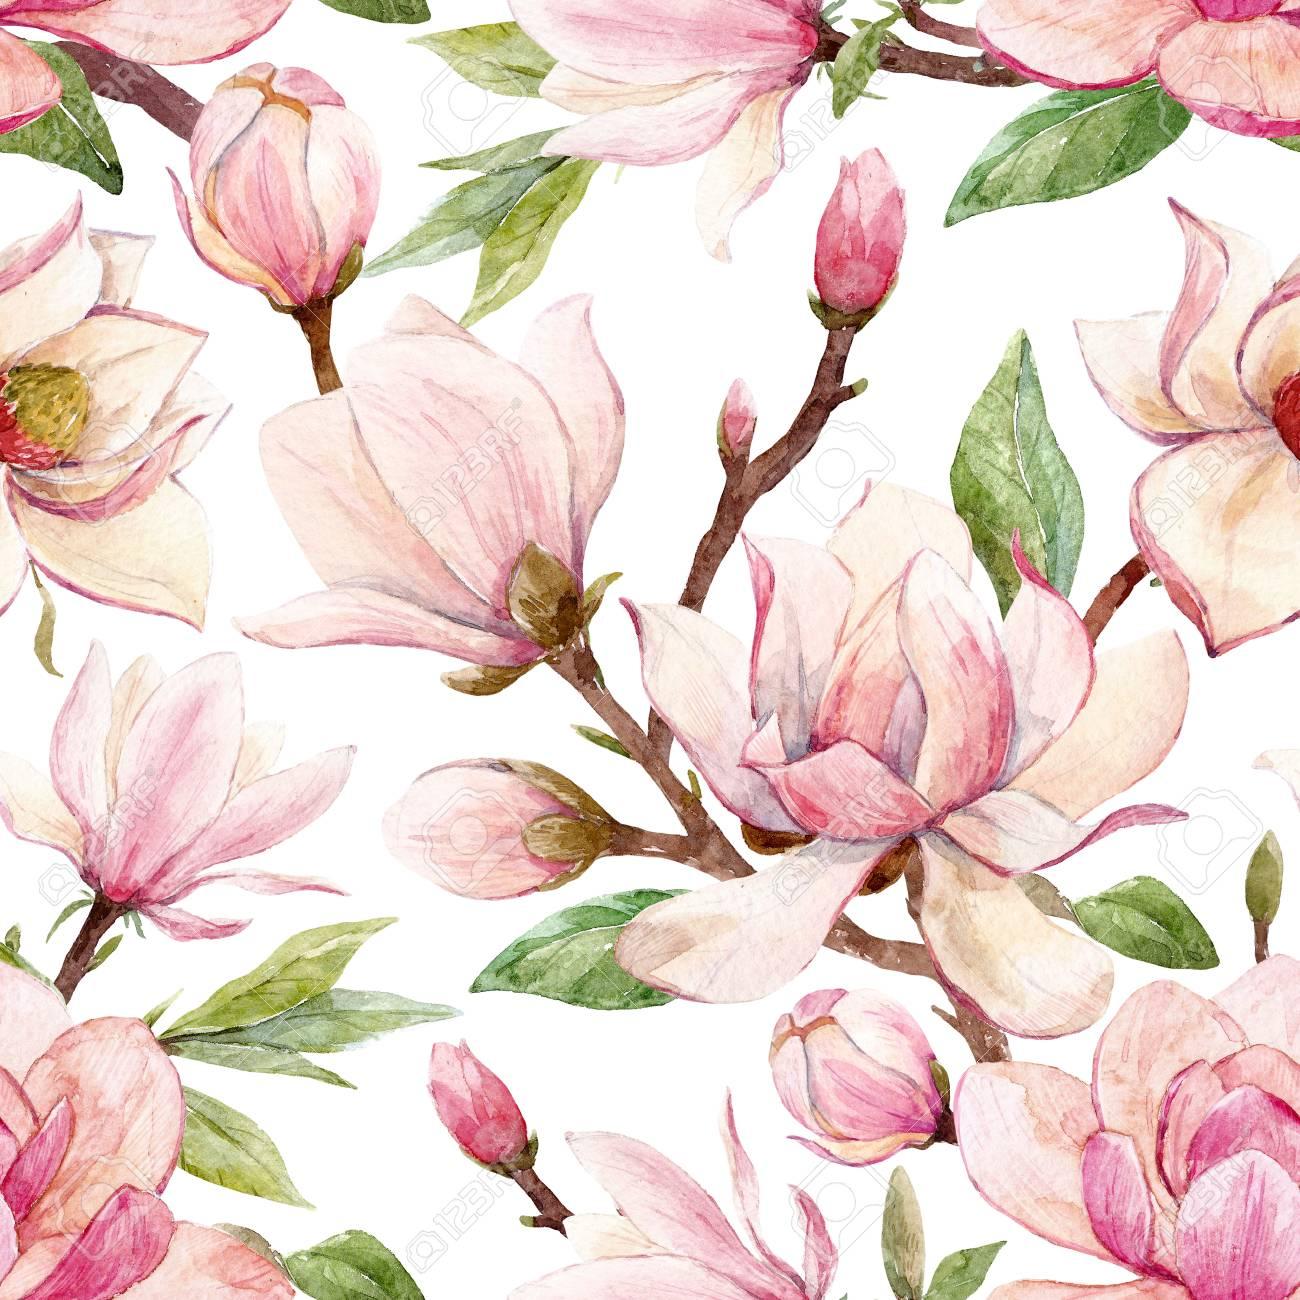 Watercolor magnolia floral pattern - 93884796